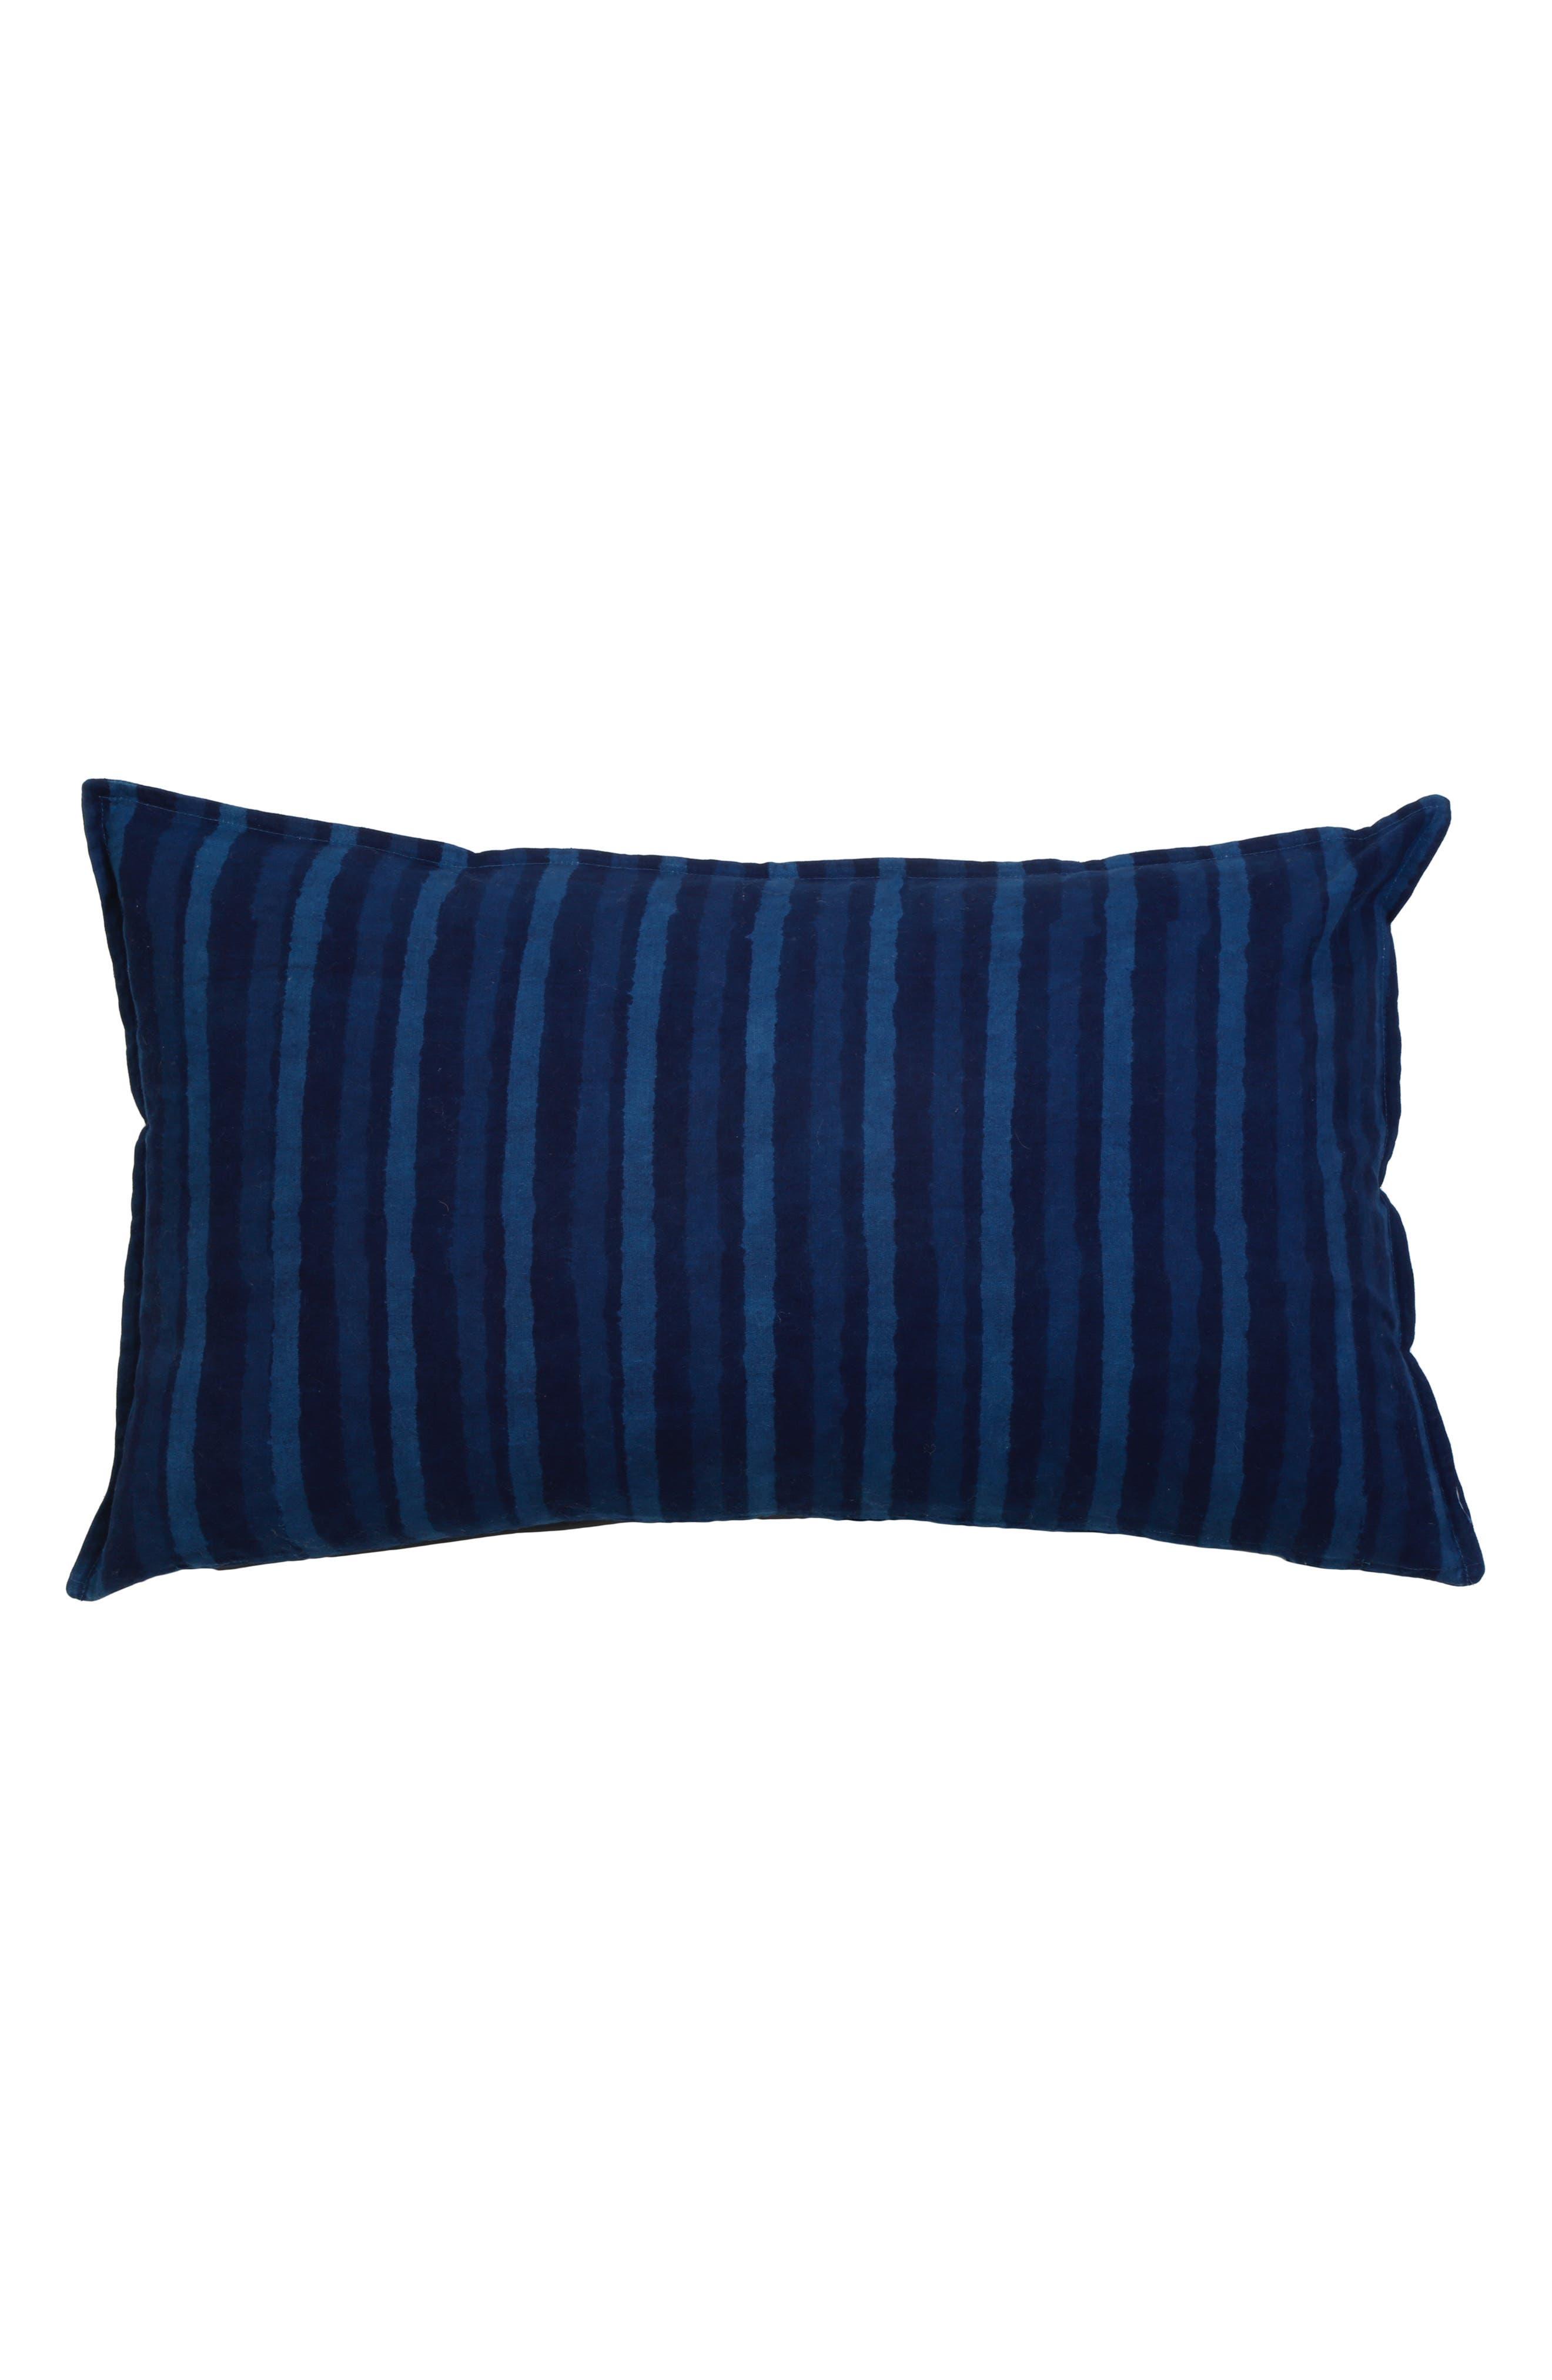 Indigo Stripe Accent Pillow,                             Main thumbnail 1, color,                             400